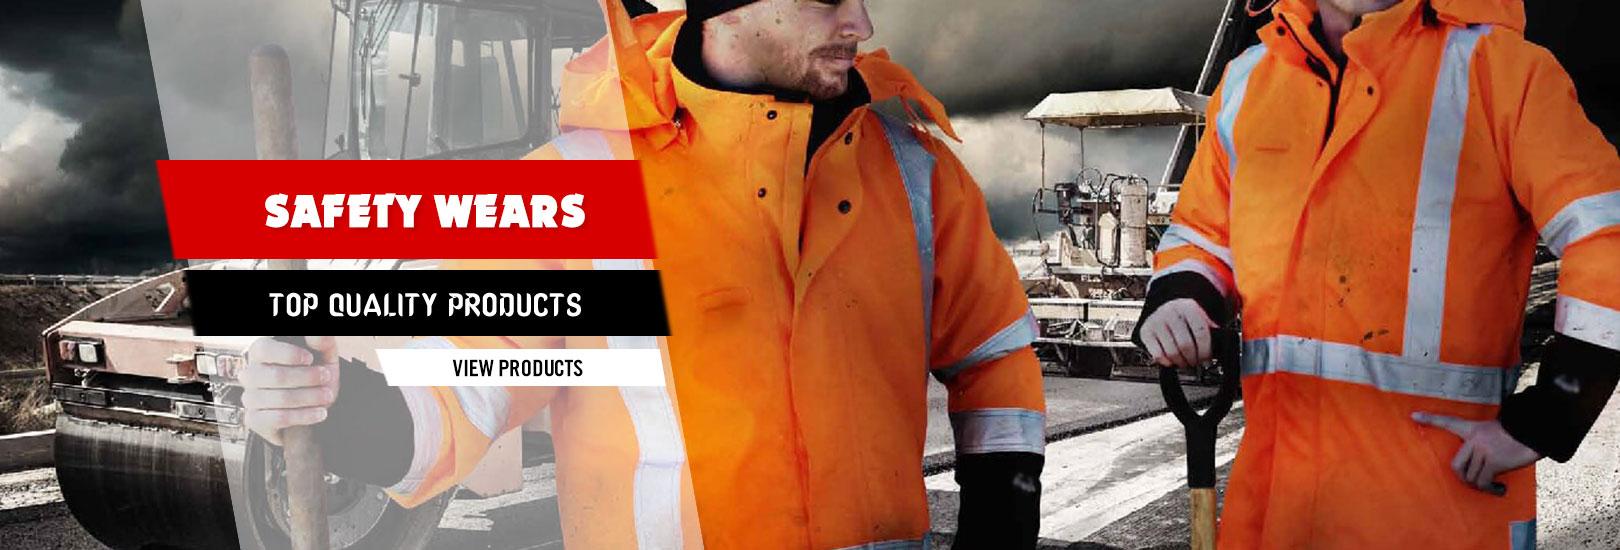 workwears-safetywears